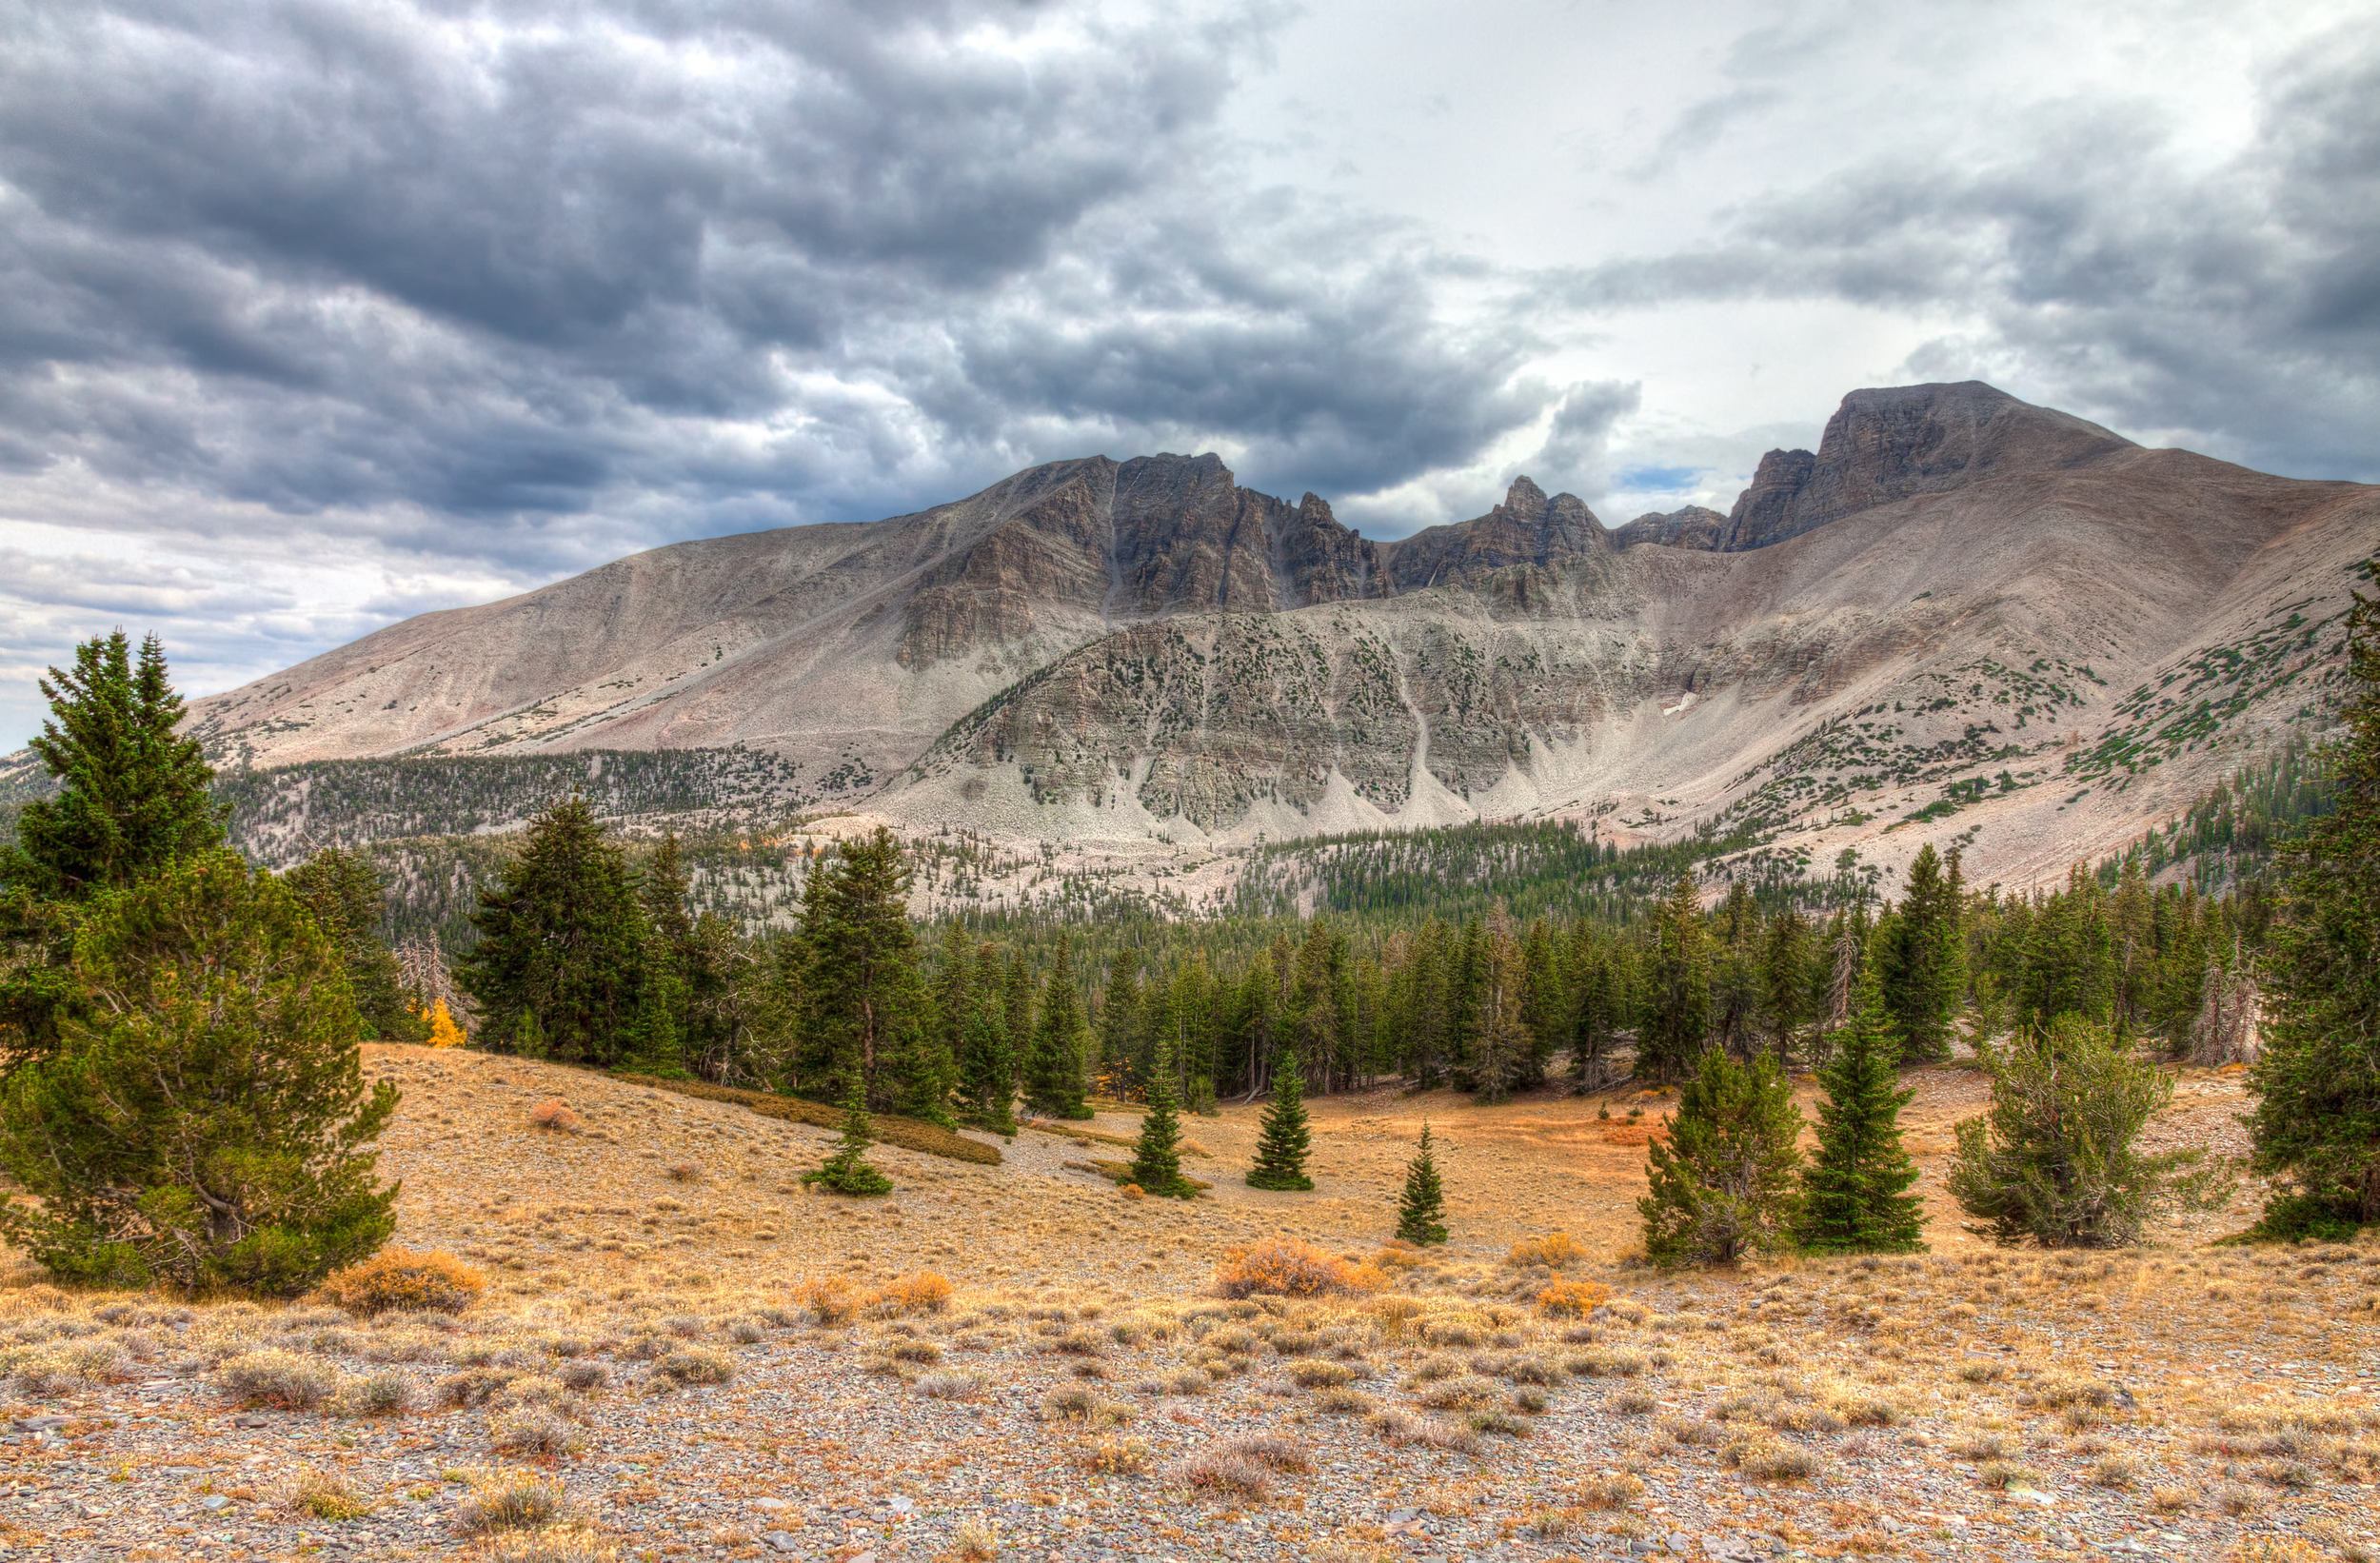 Views From Wheeler Peak Scenic Drive –(PHOTO:Arlene Treiber Waller/SHUTTERSTOCK)